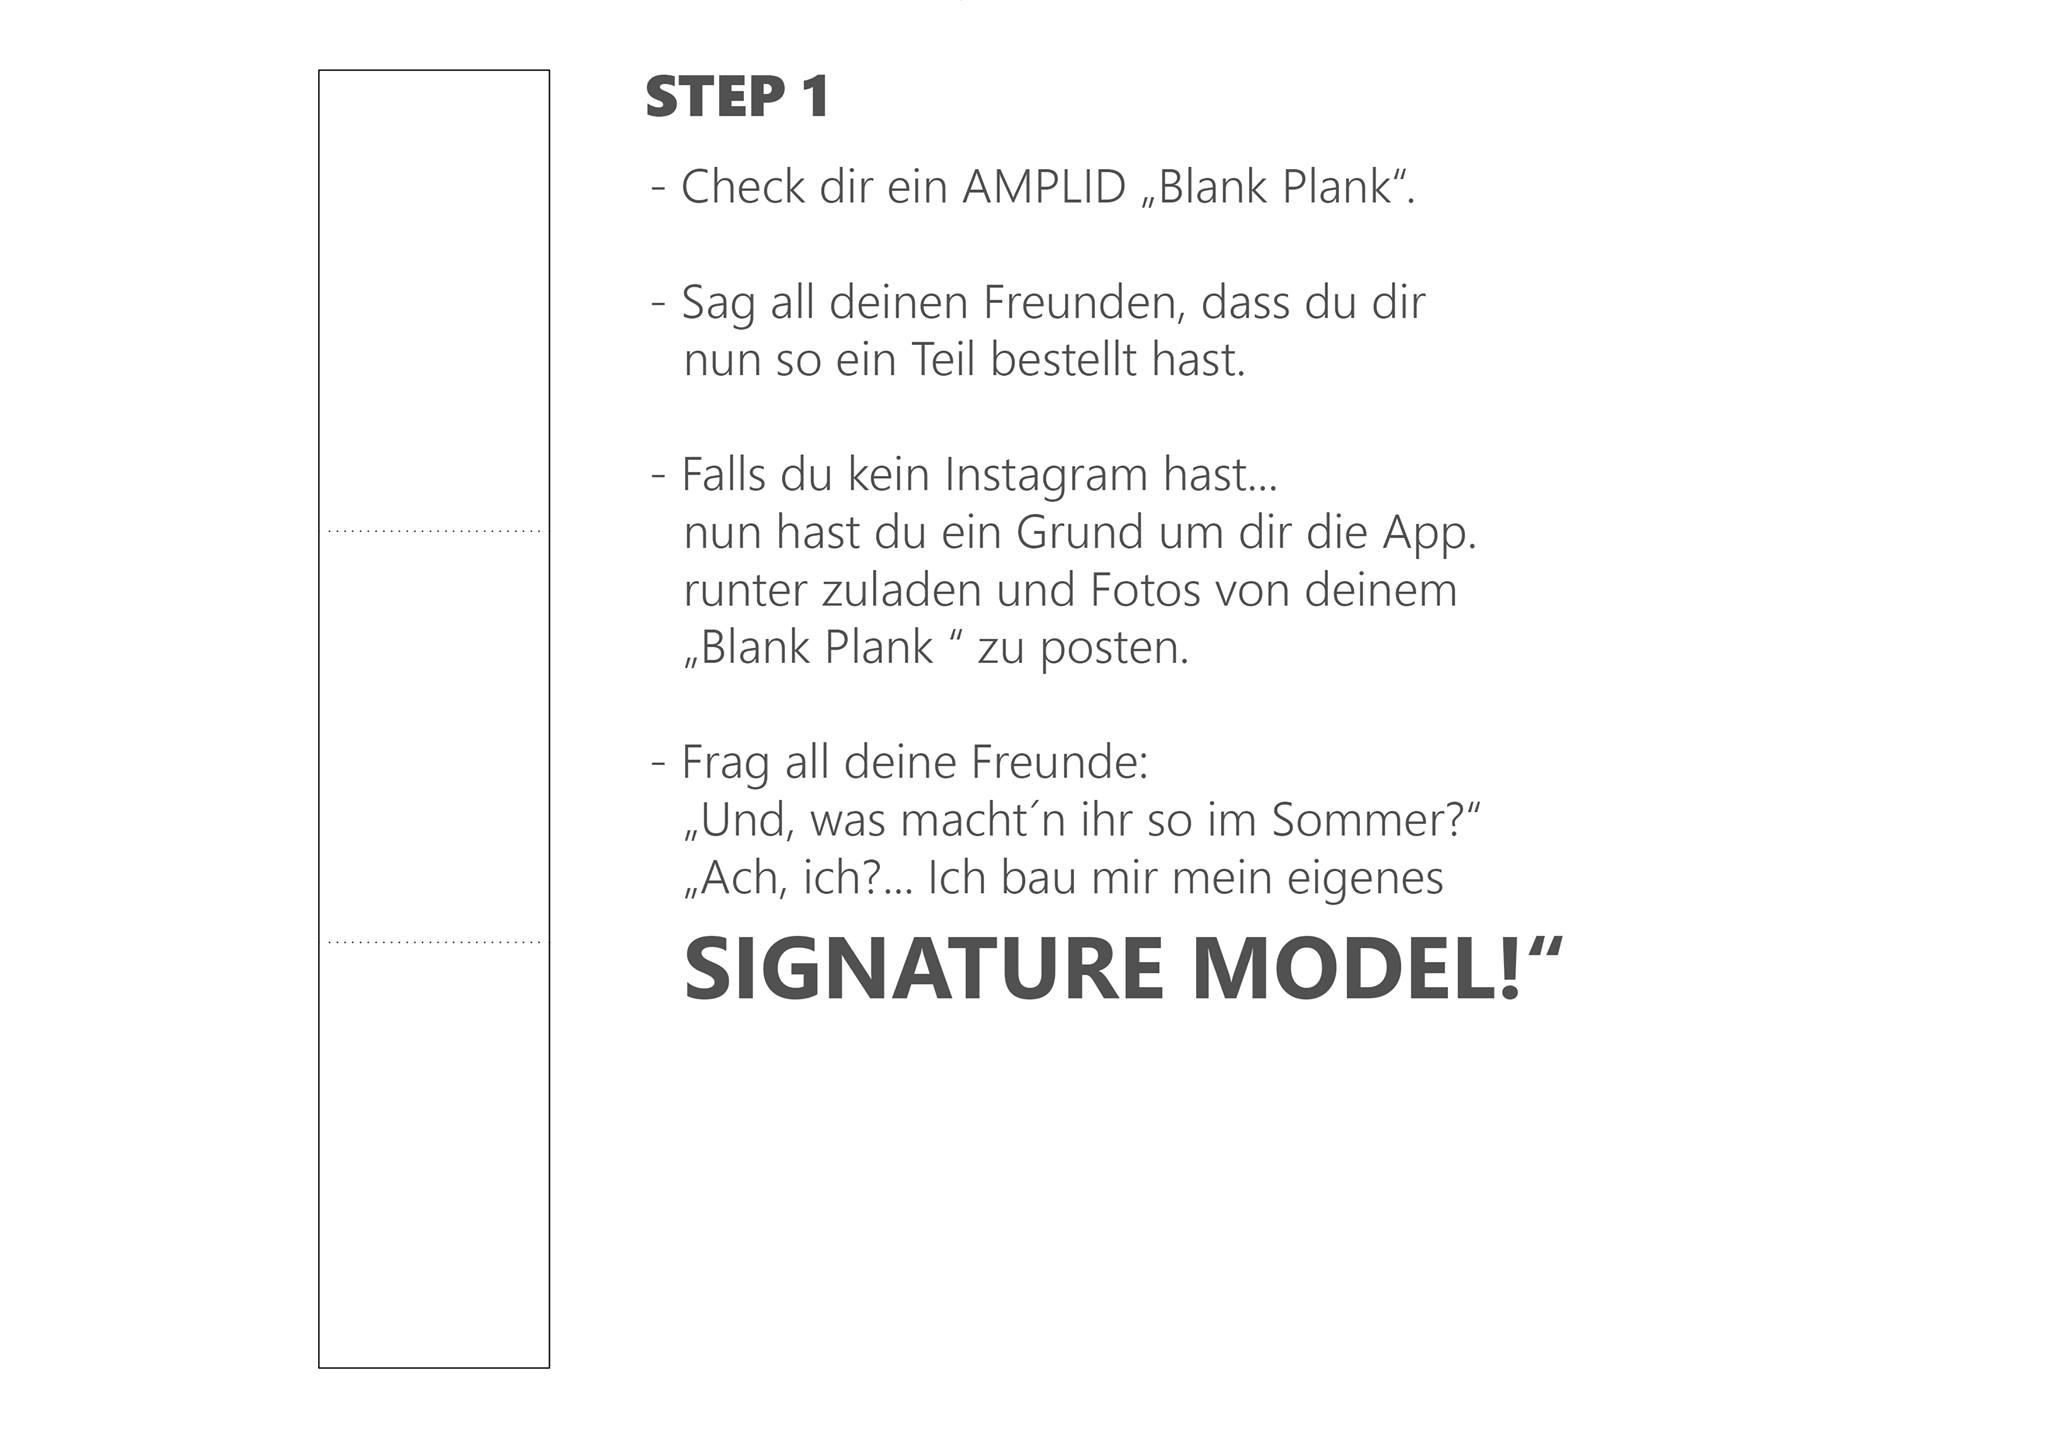 die-offizielle-bauanleitung-fuer-das-amplid-blank-plank-prokjekt-1